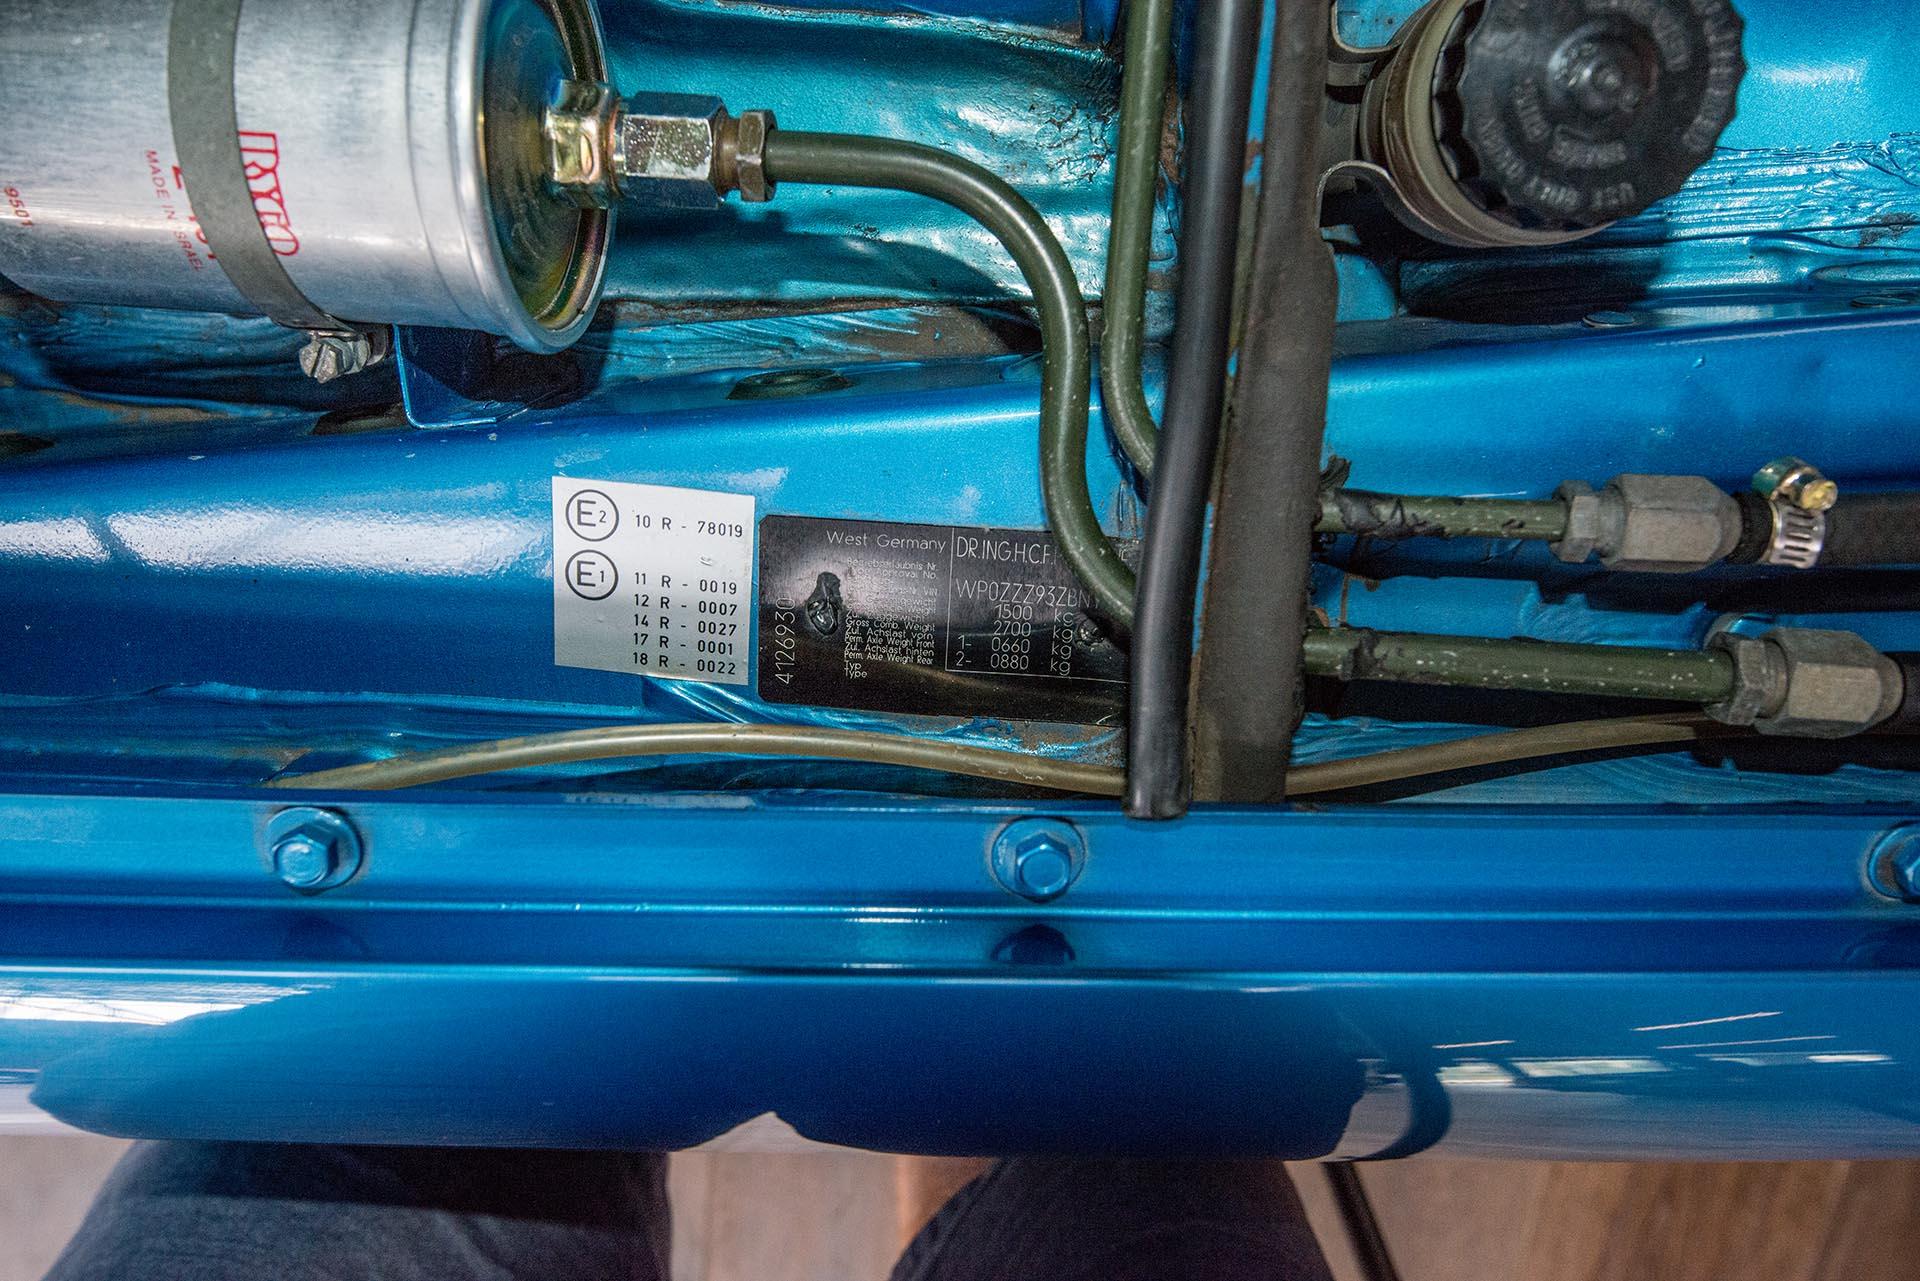 Porsche 924 Turbo Blue (20) - Richmonds - Classic and